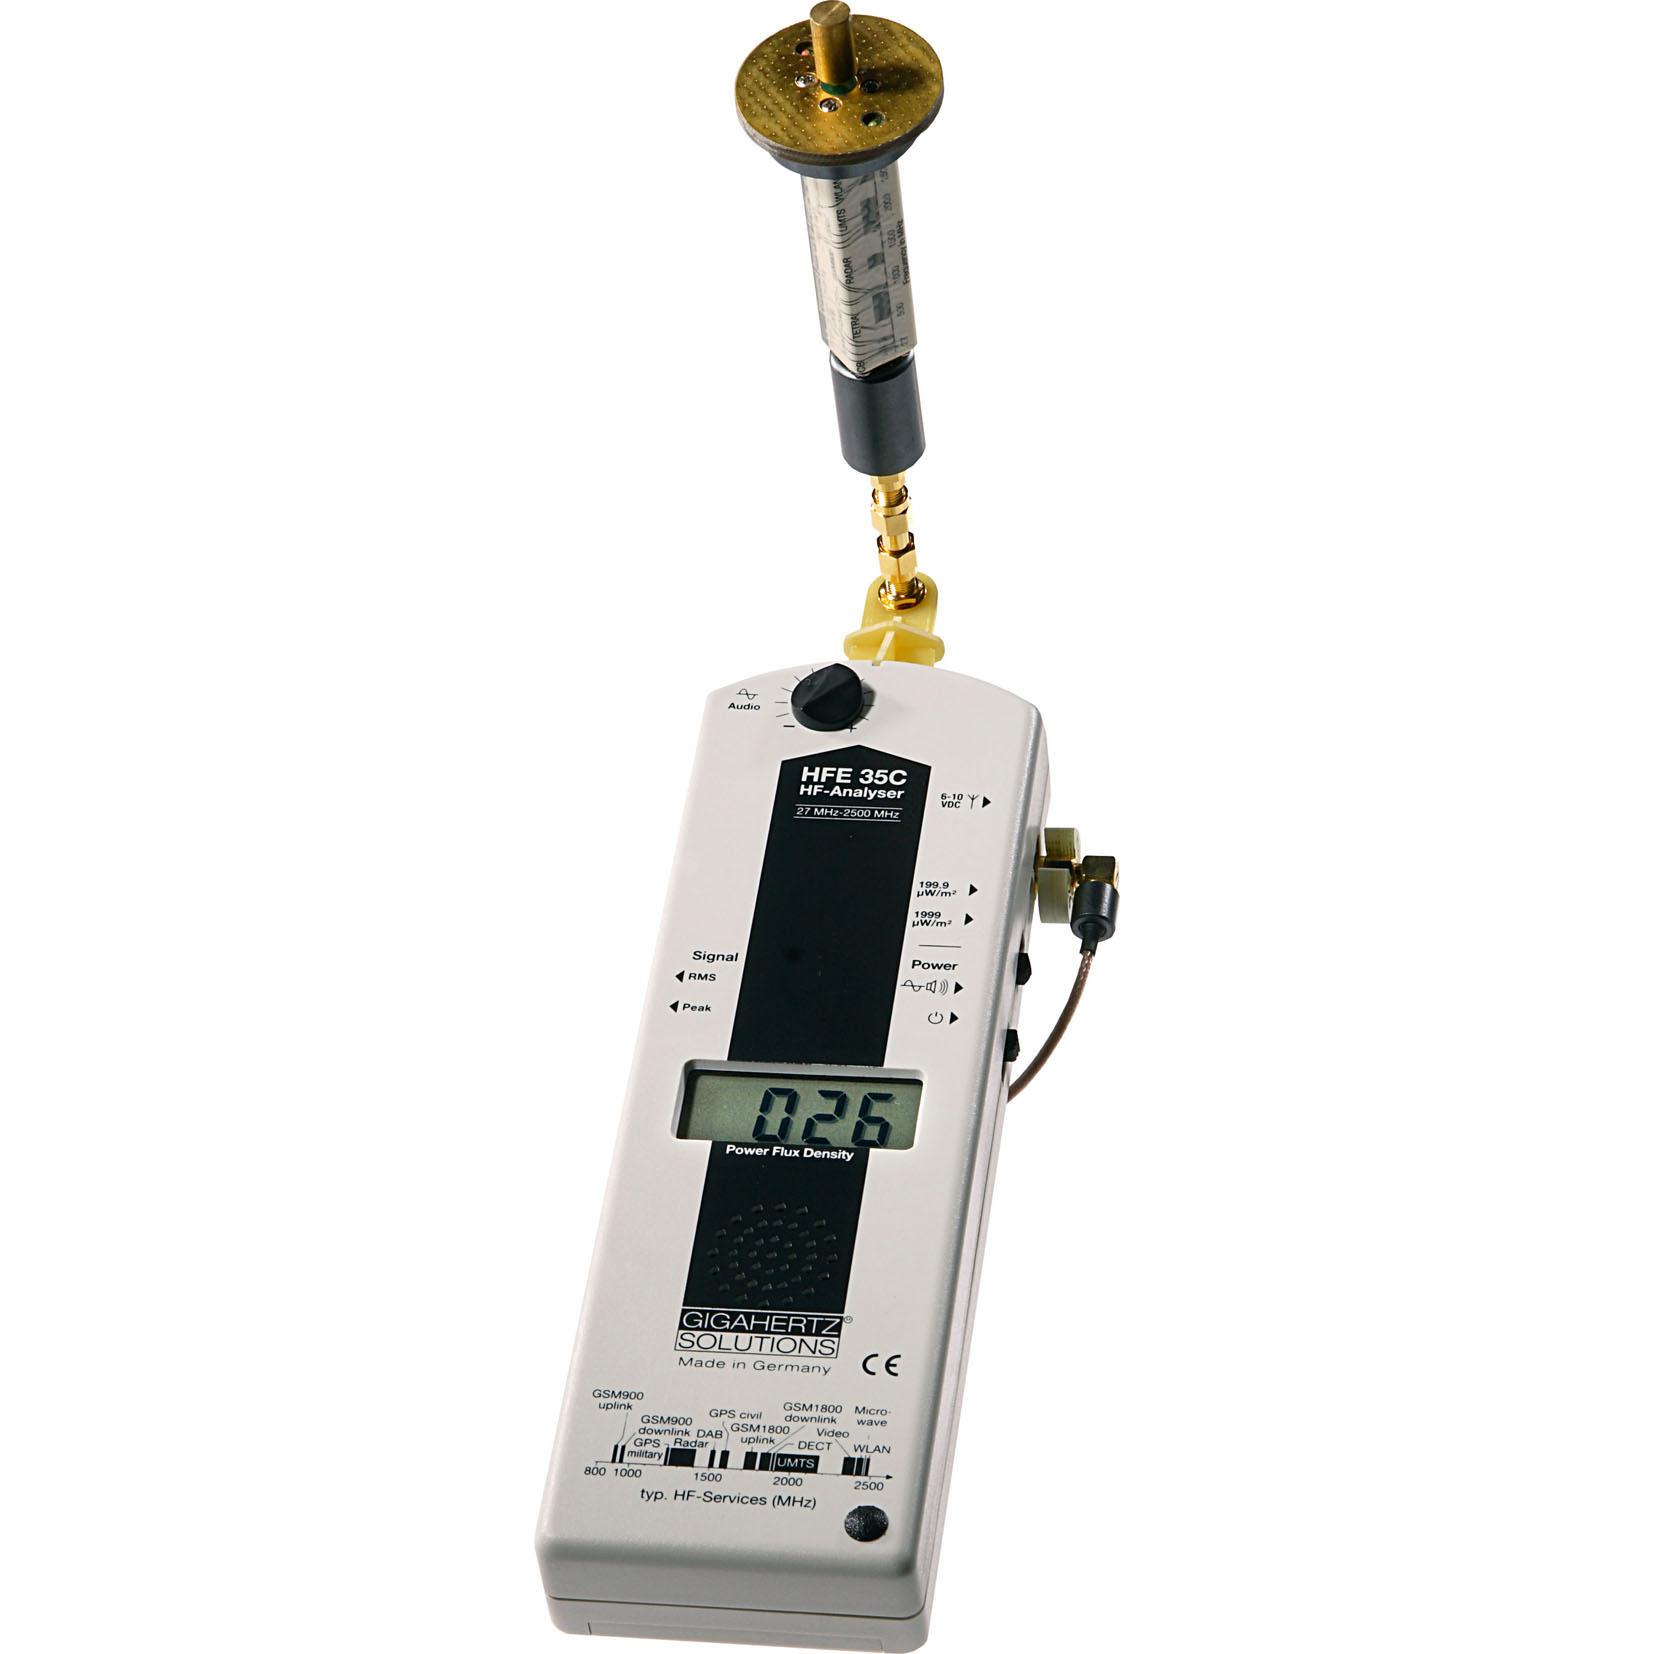 Directional Frequency Counter : Hfe c intermediate rf meter analyzer gigahertz